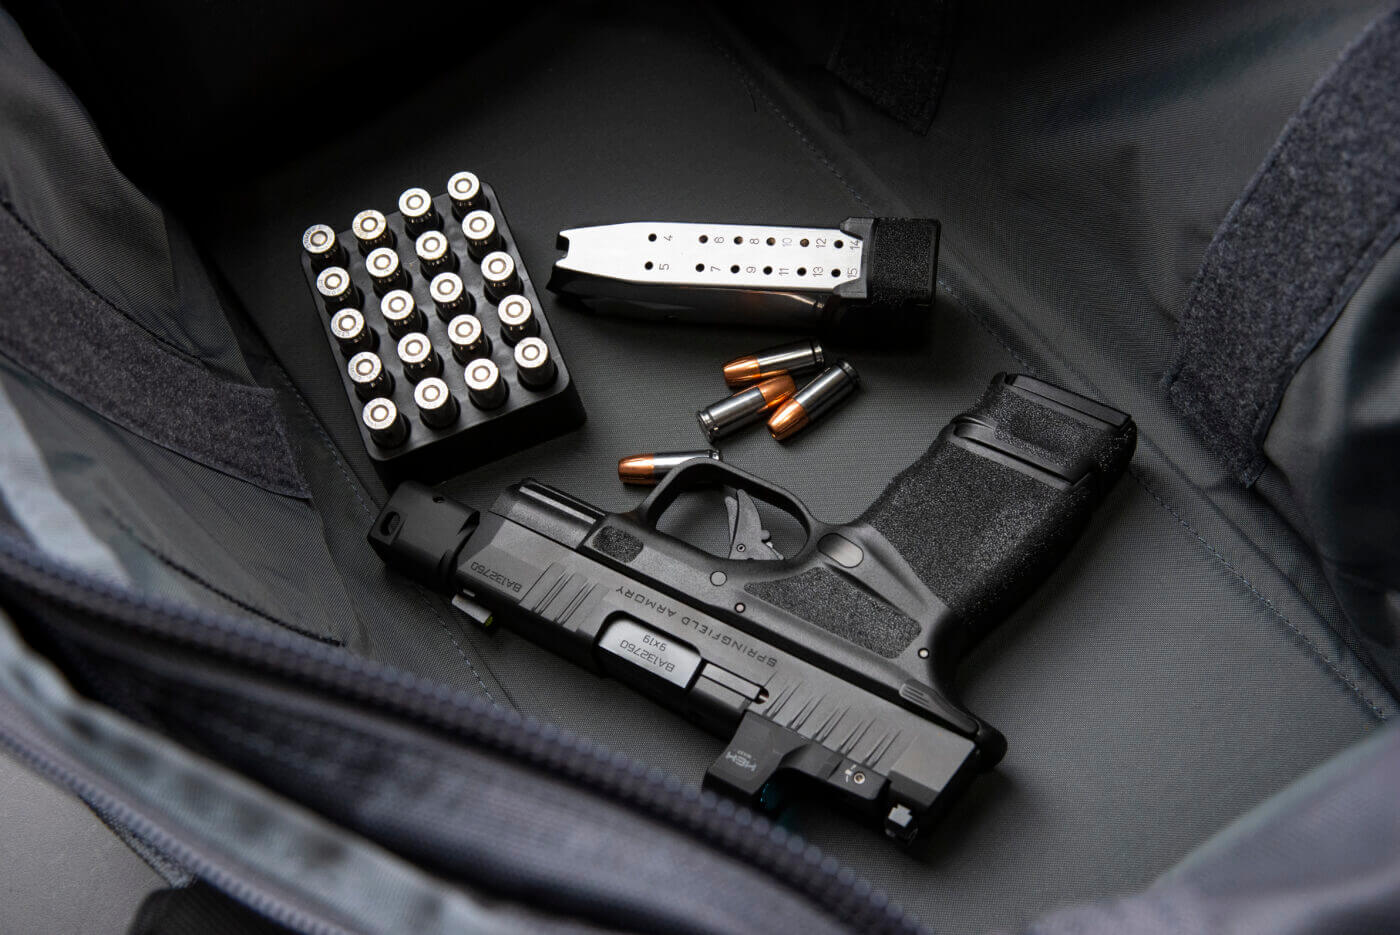 15-round magazine for the Springfield Armory Hellcat pistol